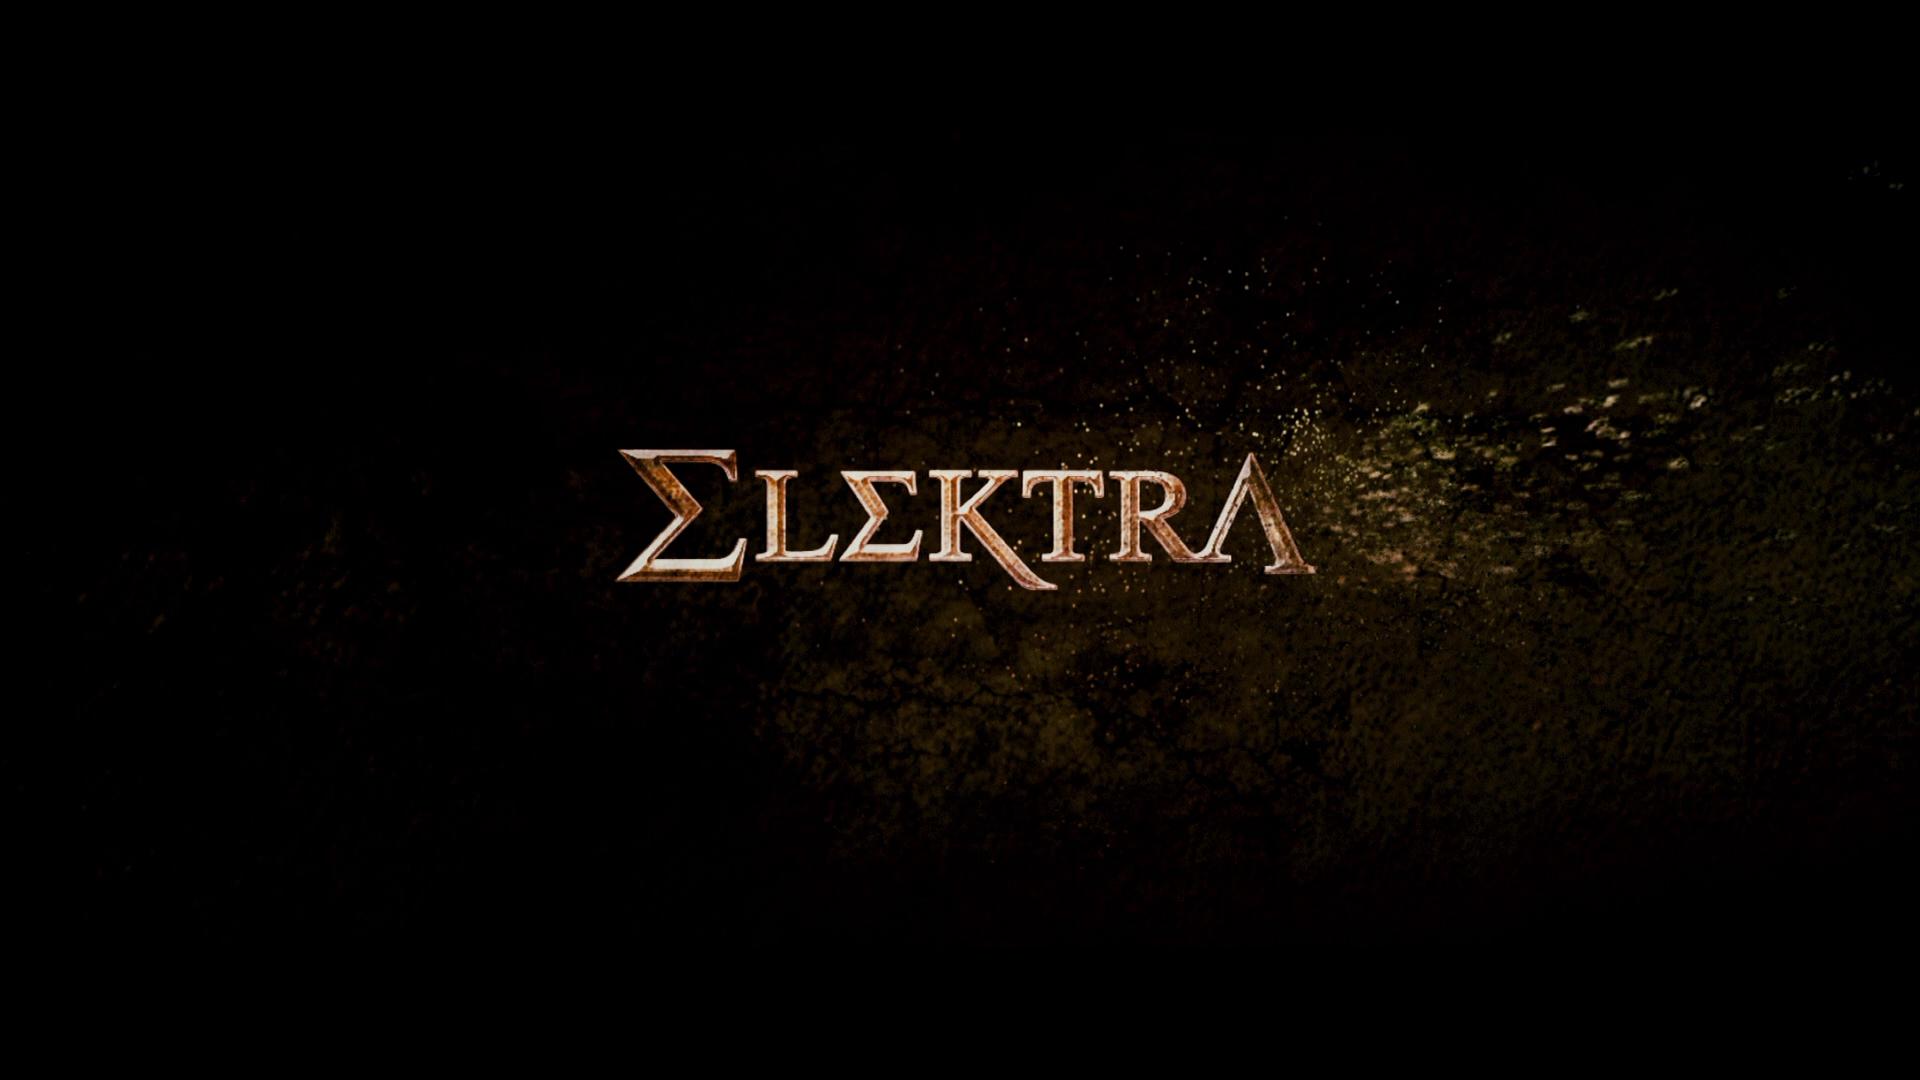 Elektra - Opening Title Logo